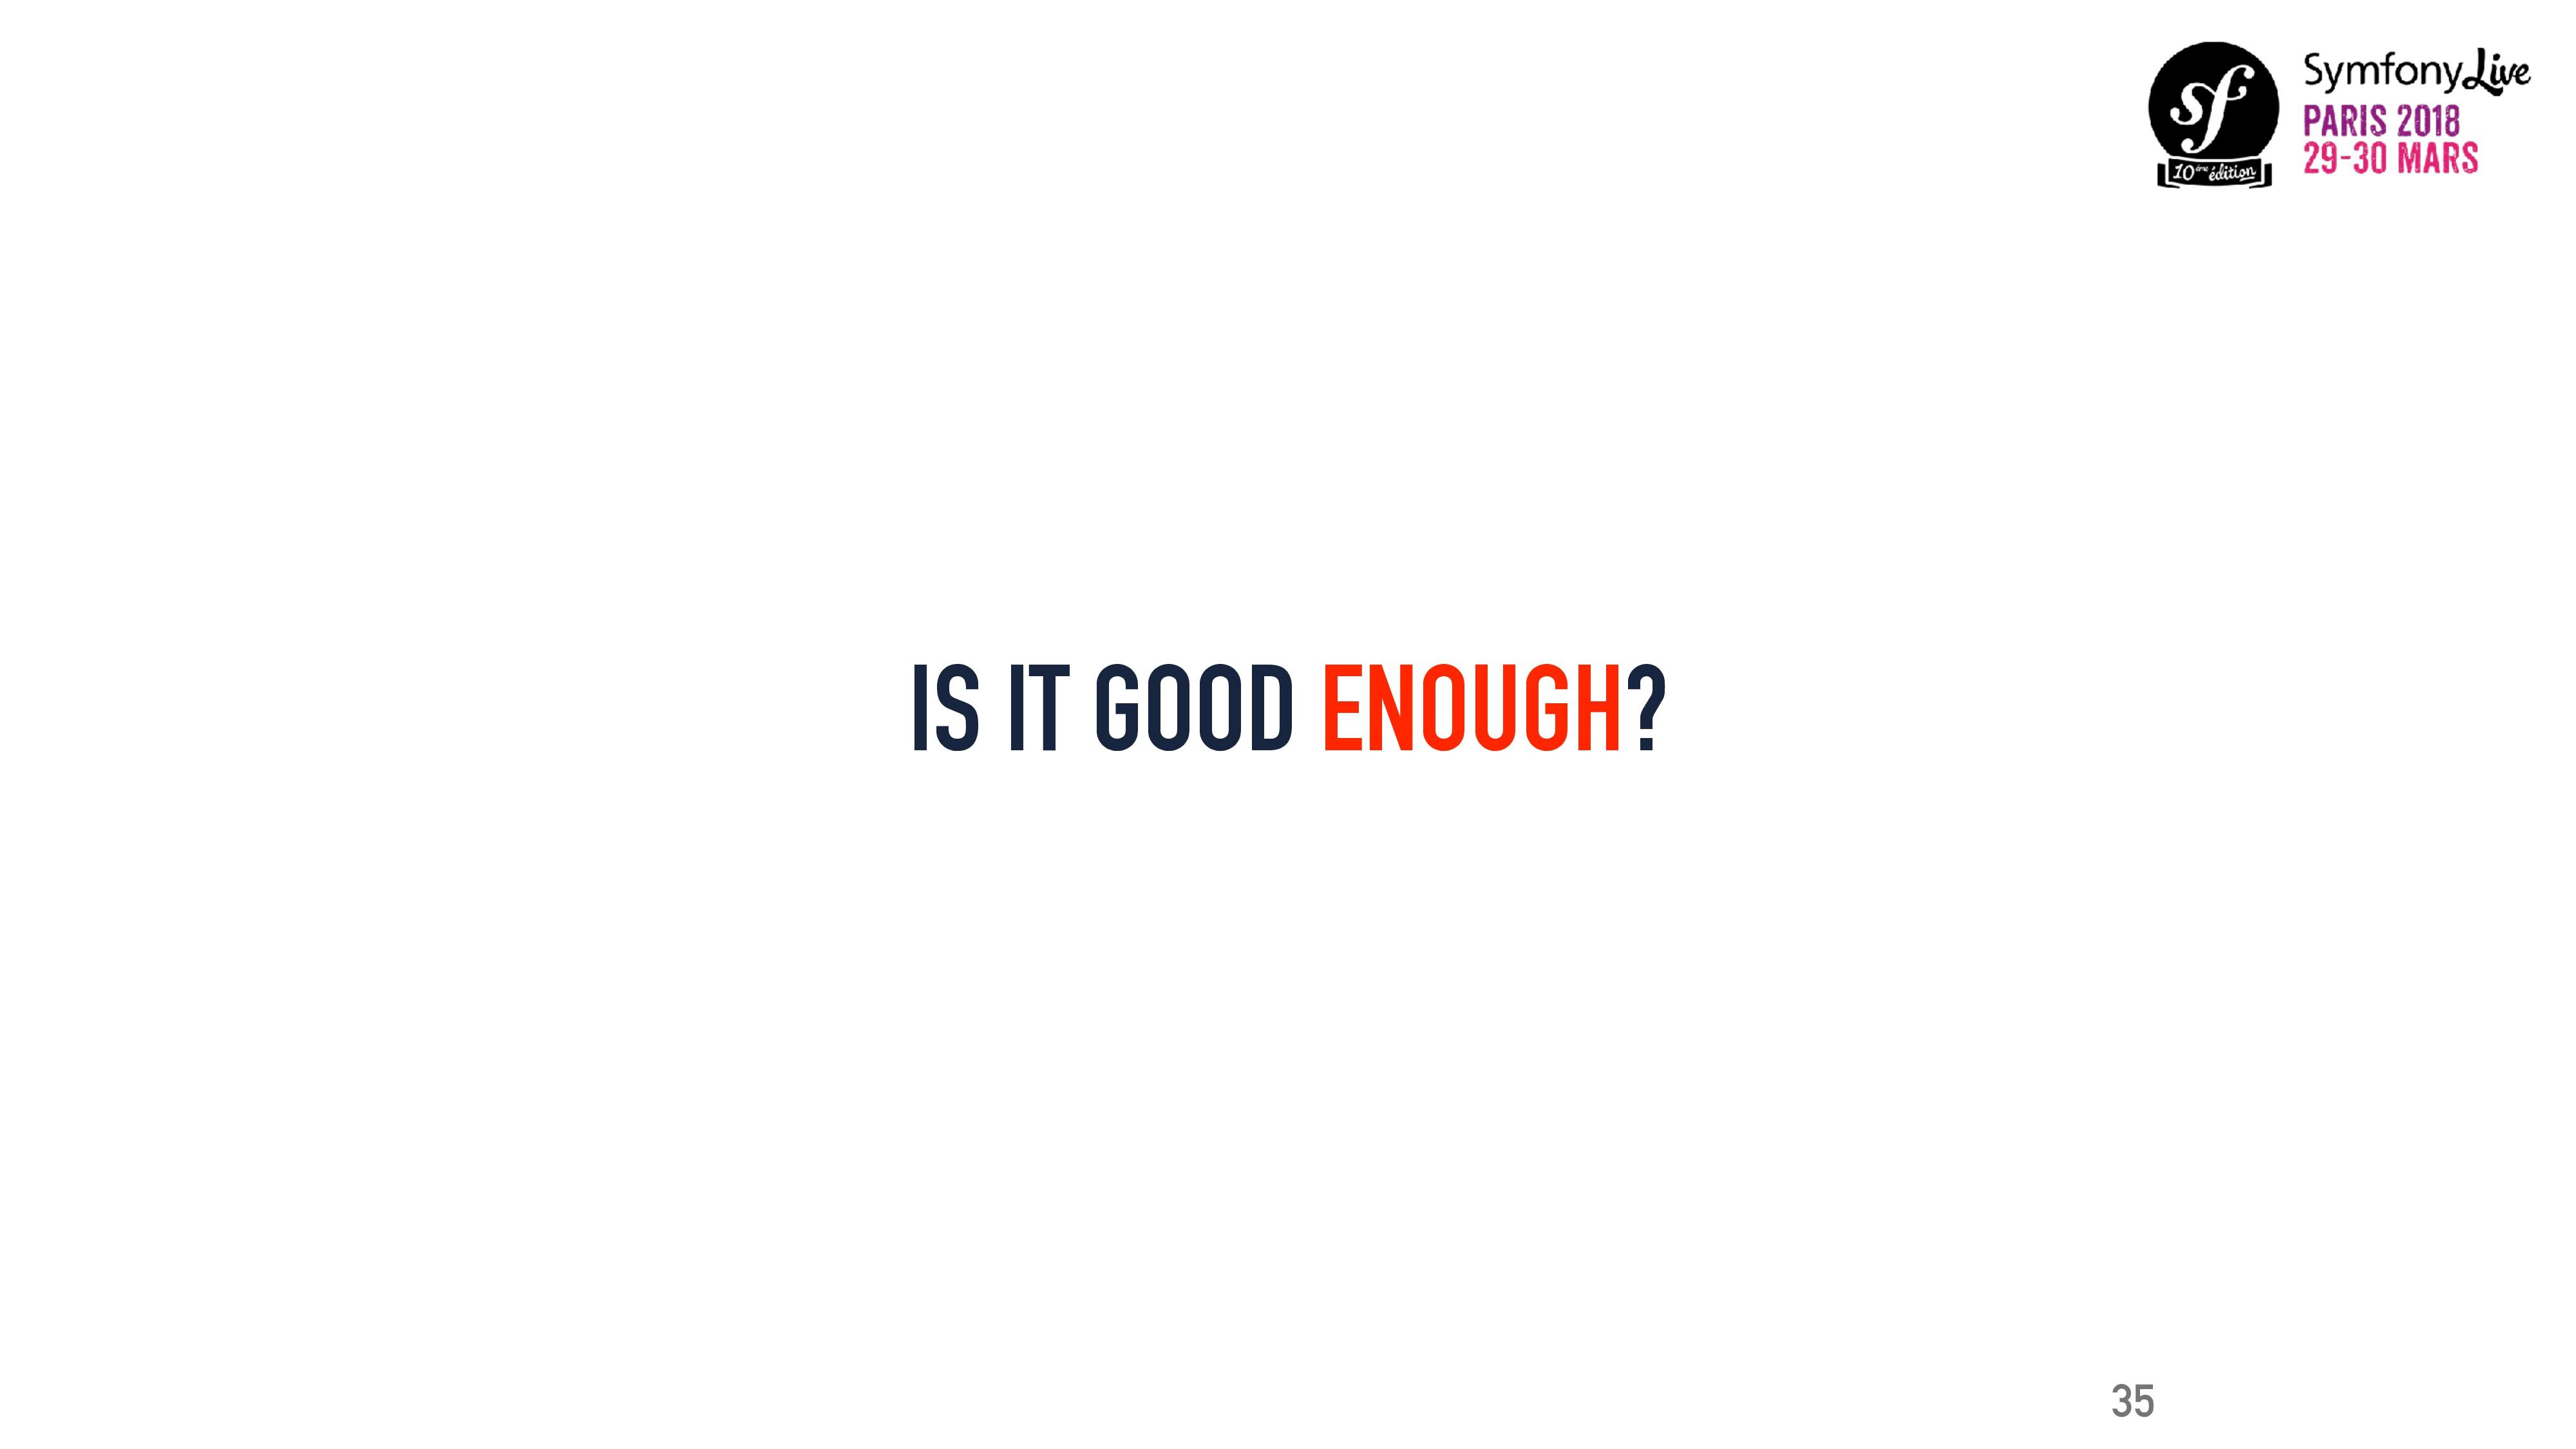 IS IT GOOD ENOUGH? 35